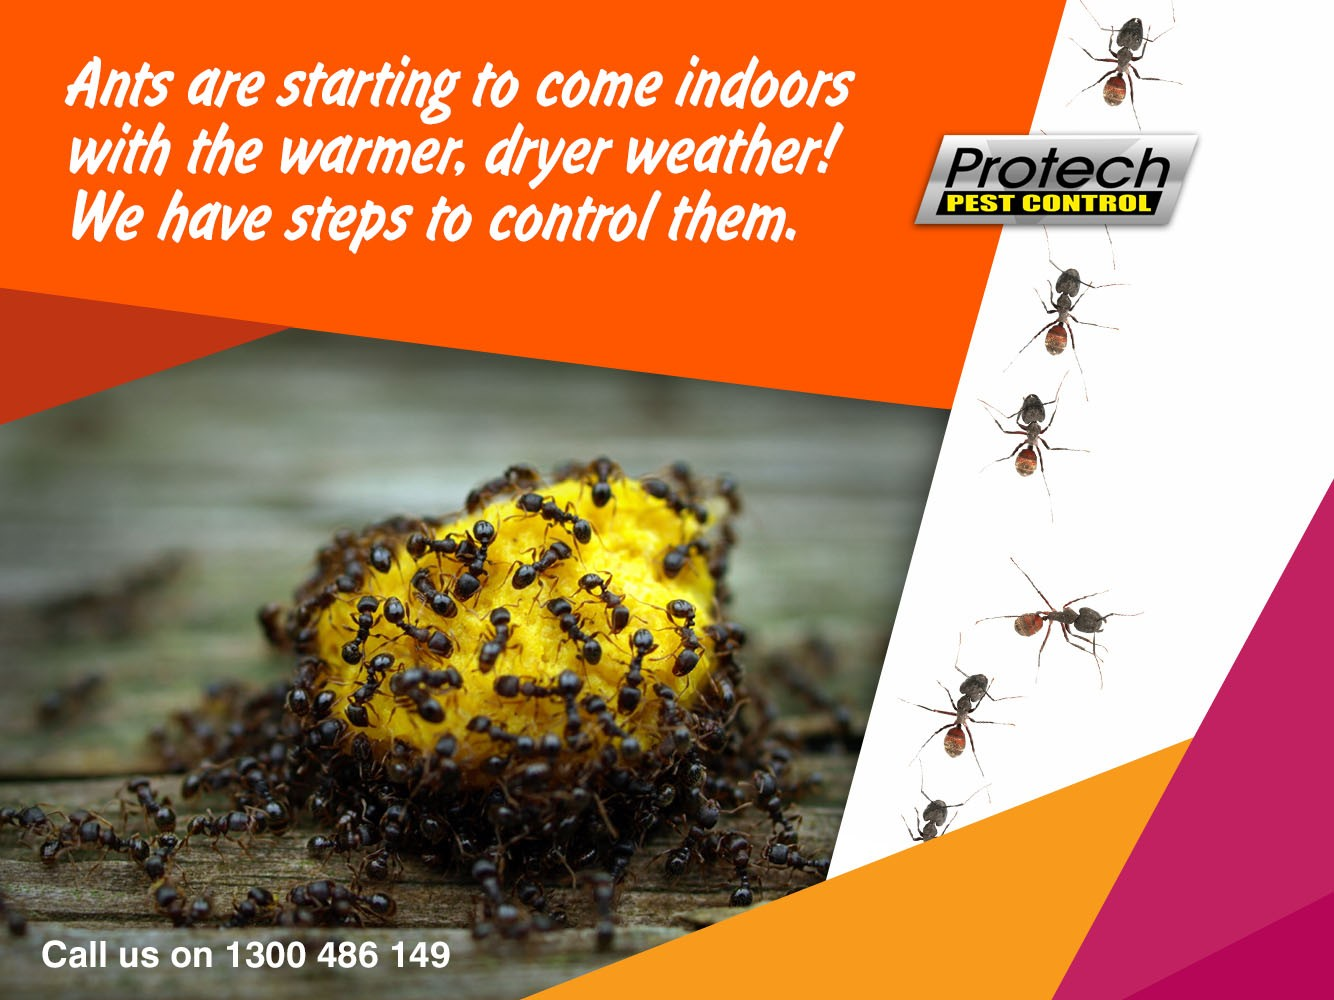 Protech Pest Control